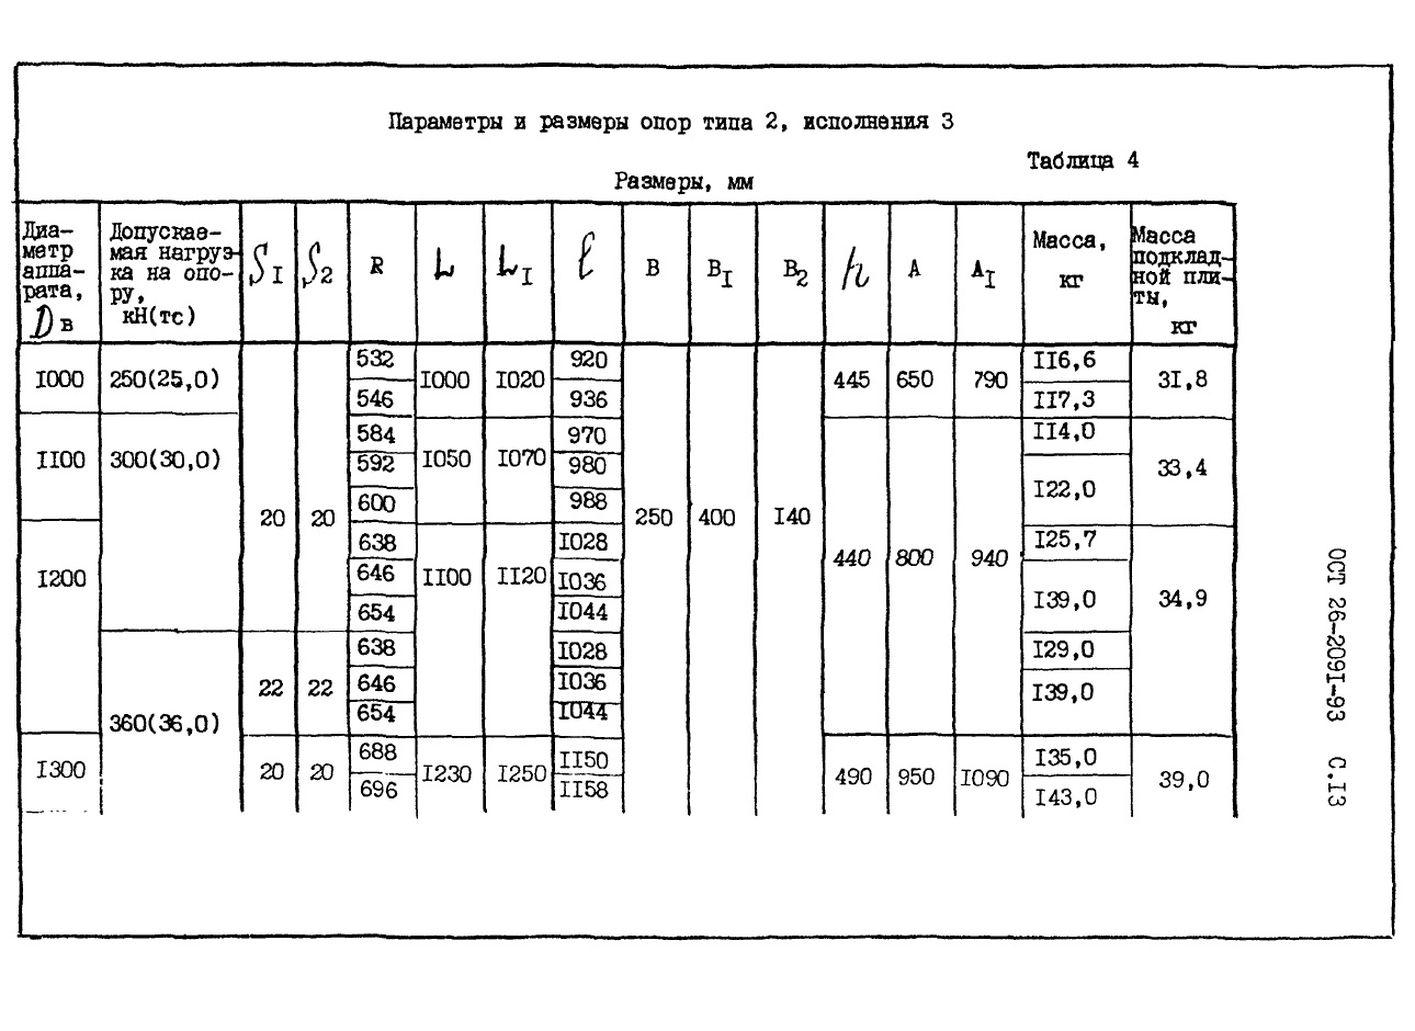 Опоры тип 2 ОСТ 26-2091-93 стр.6